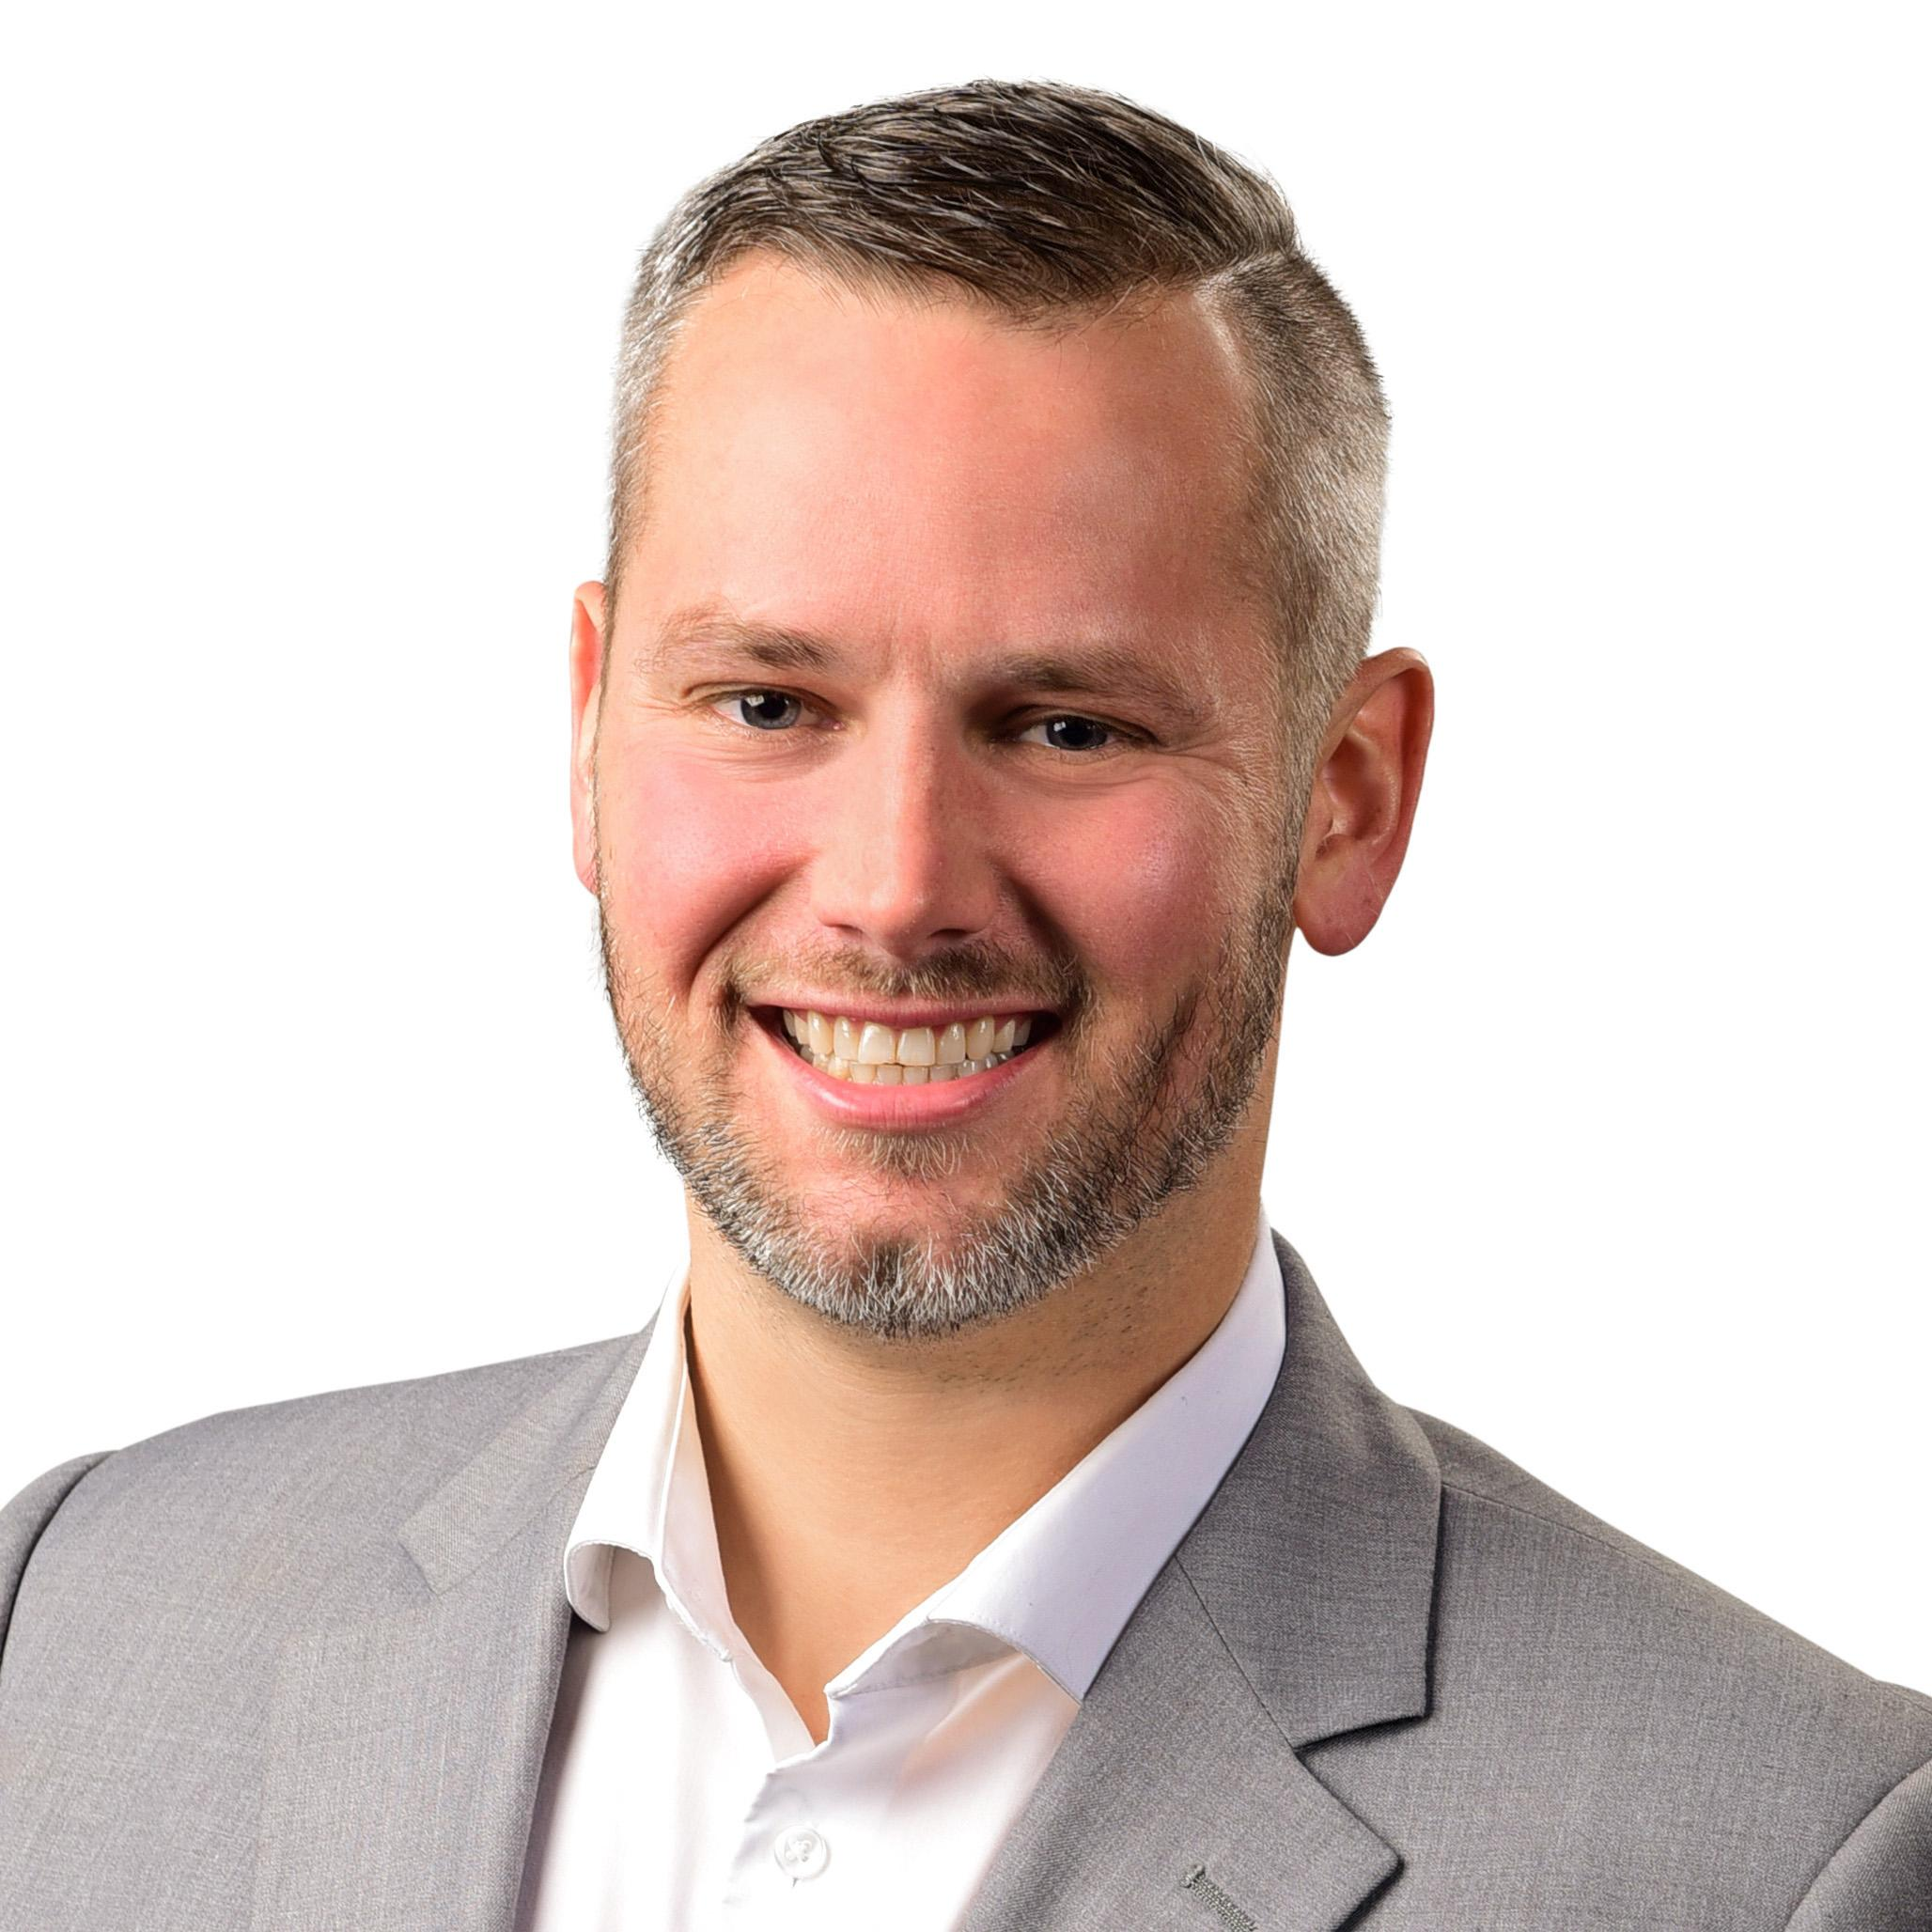 Pete Honsberger, Lead Facilitator